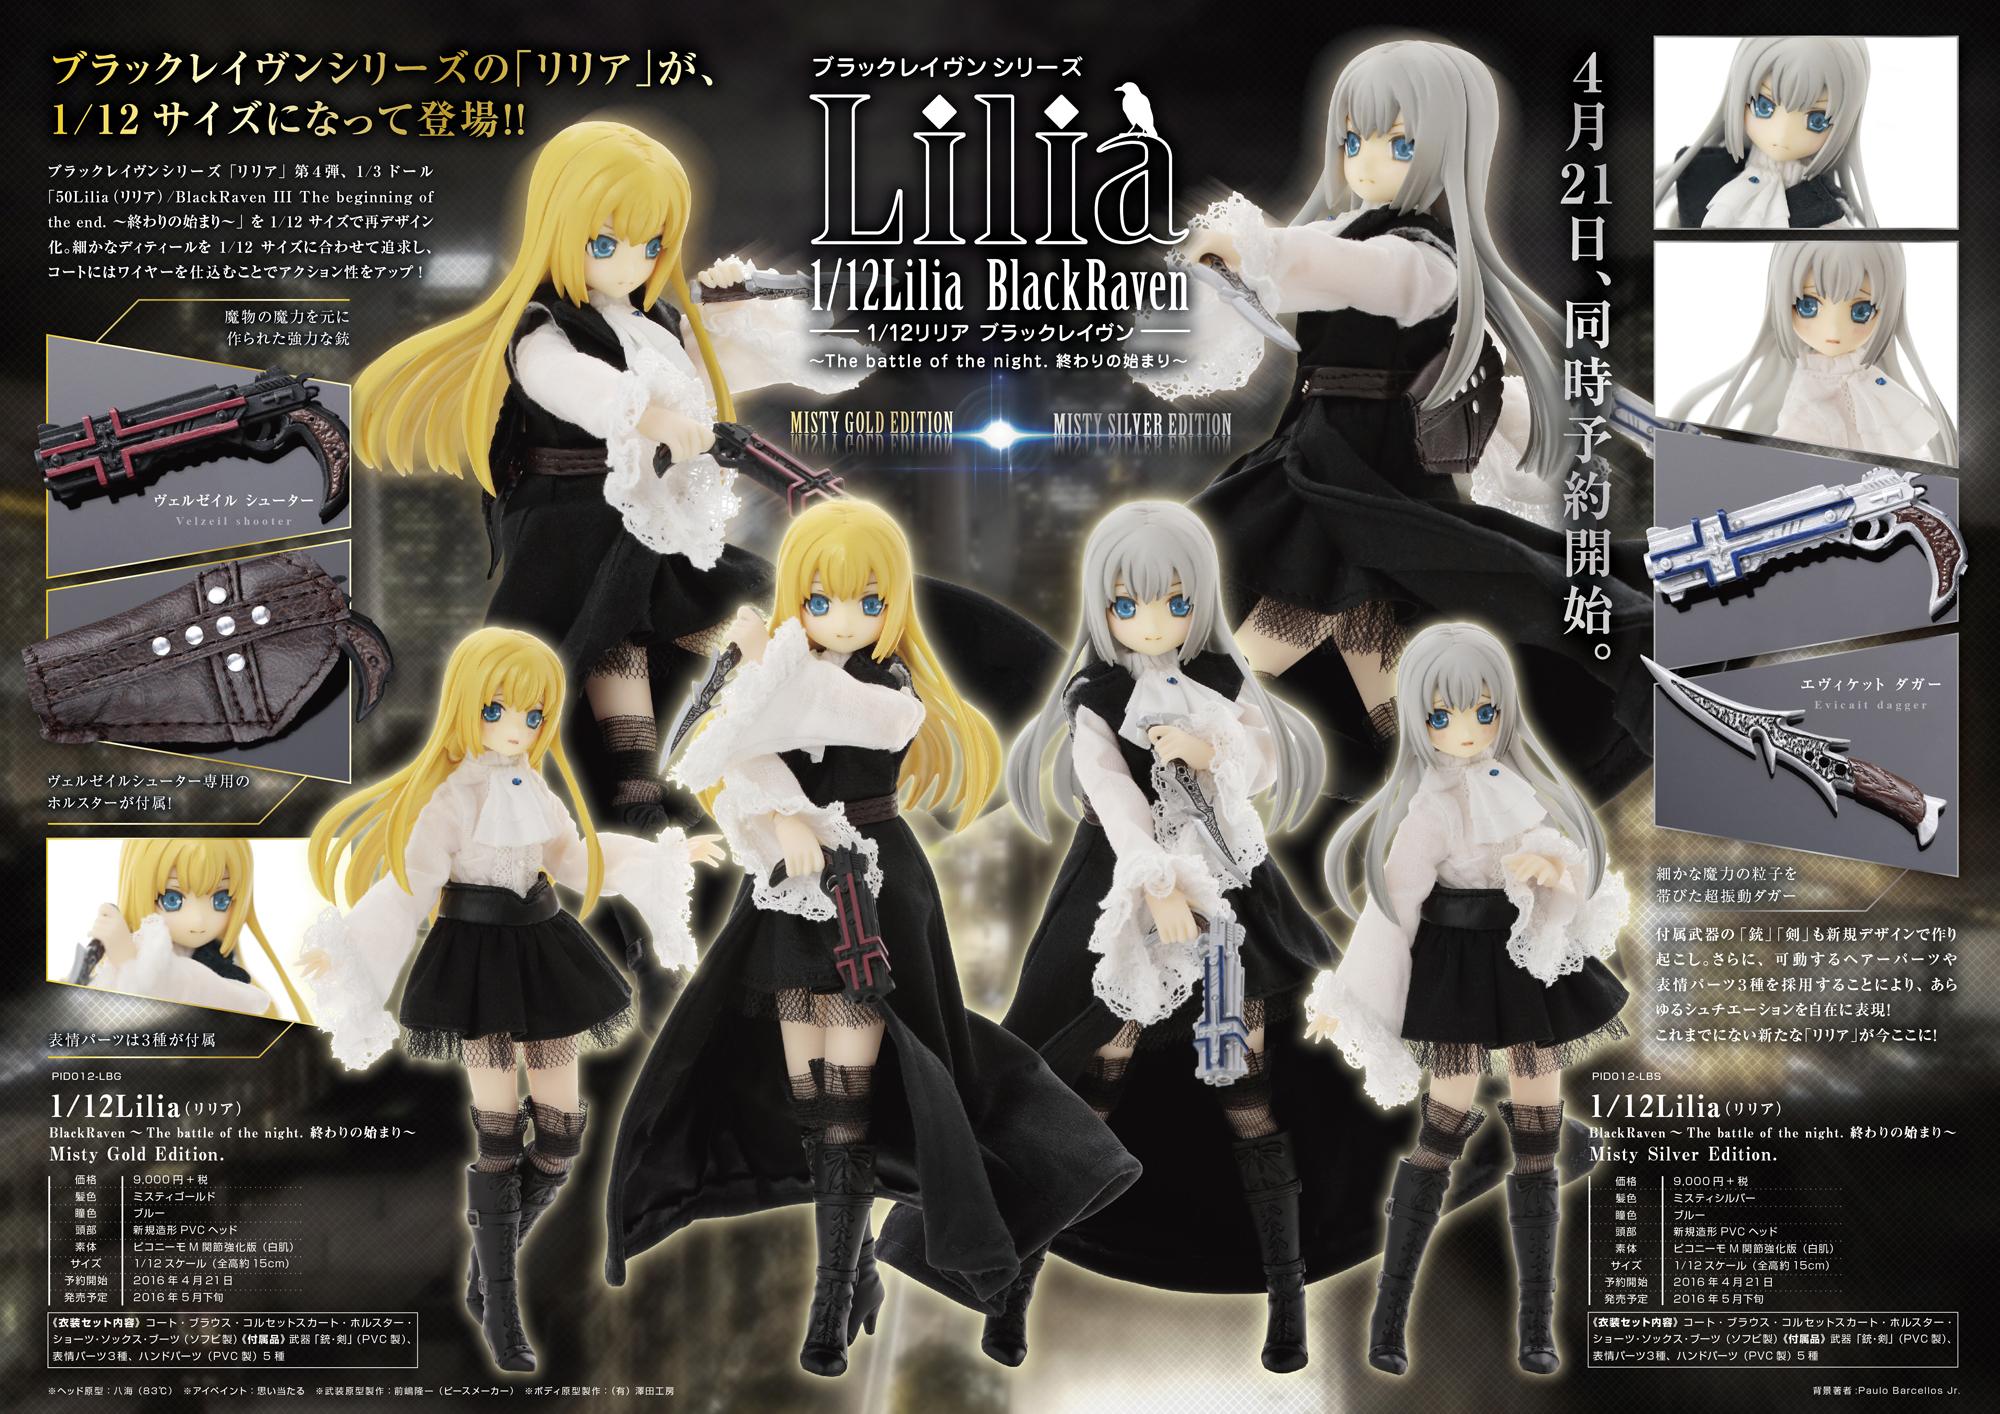 1/12Lilia BlackRaven~The battle of the night. 終わりの始まり~